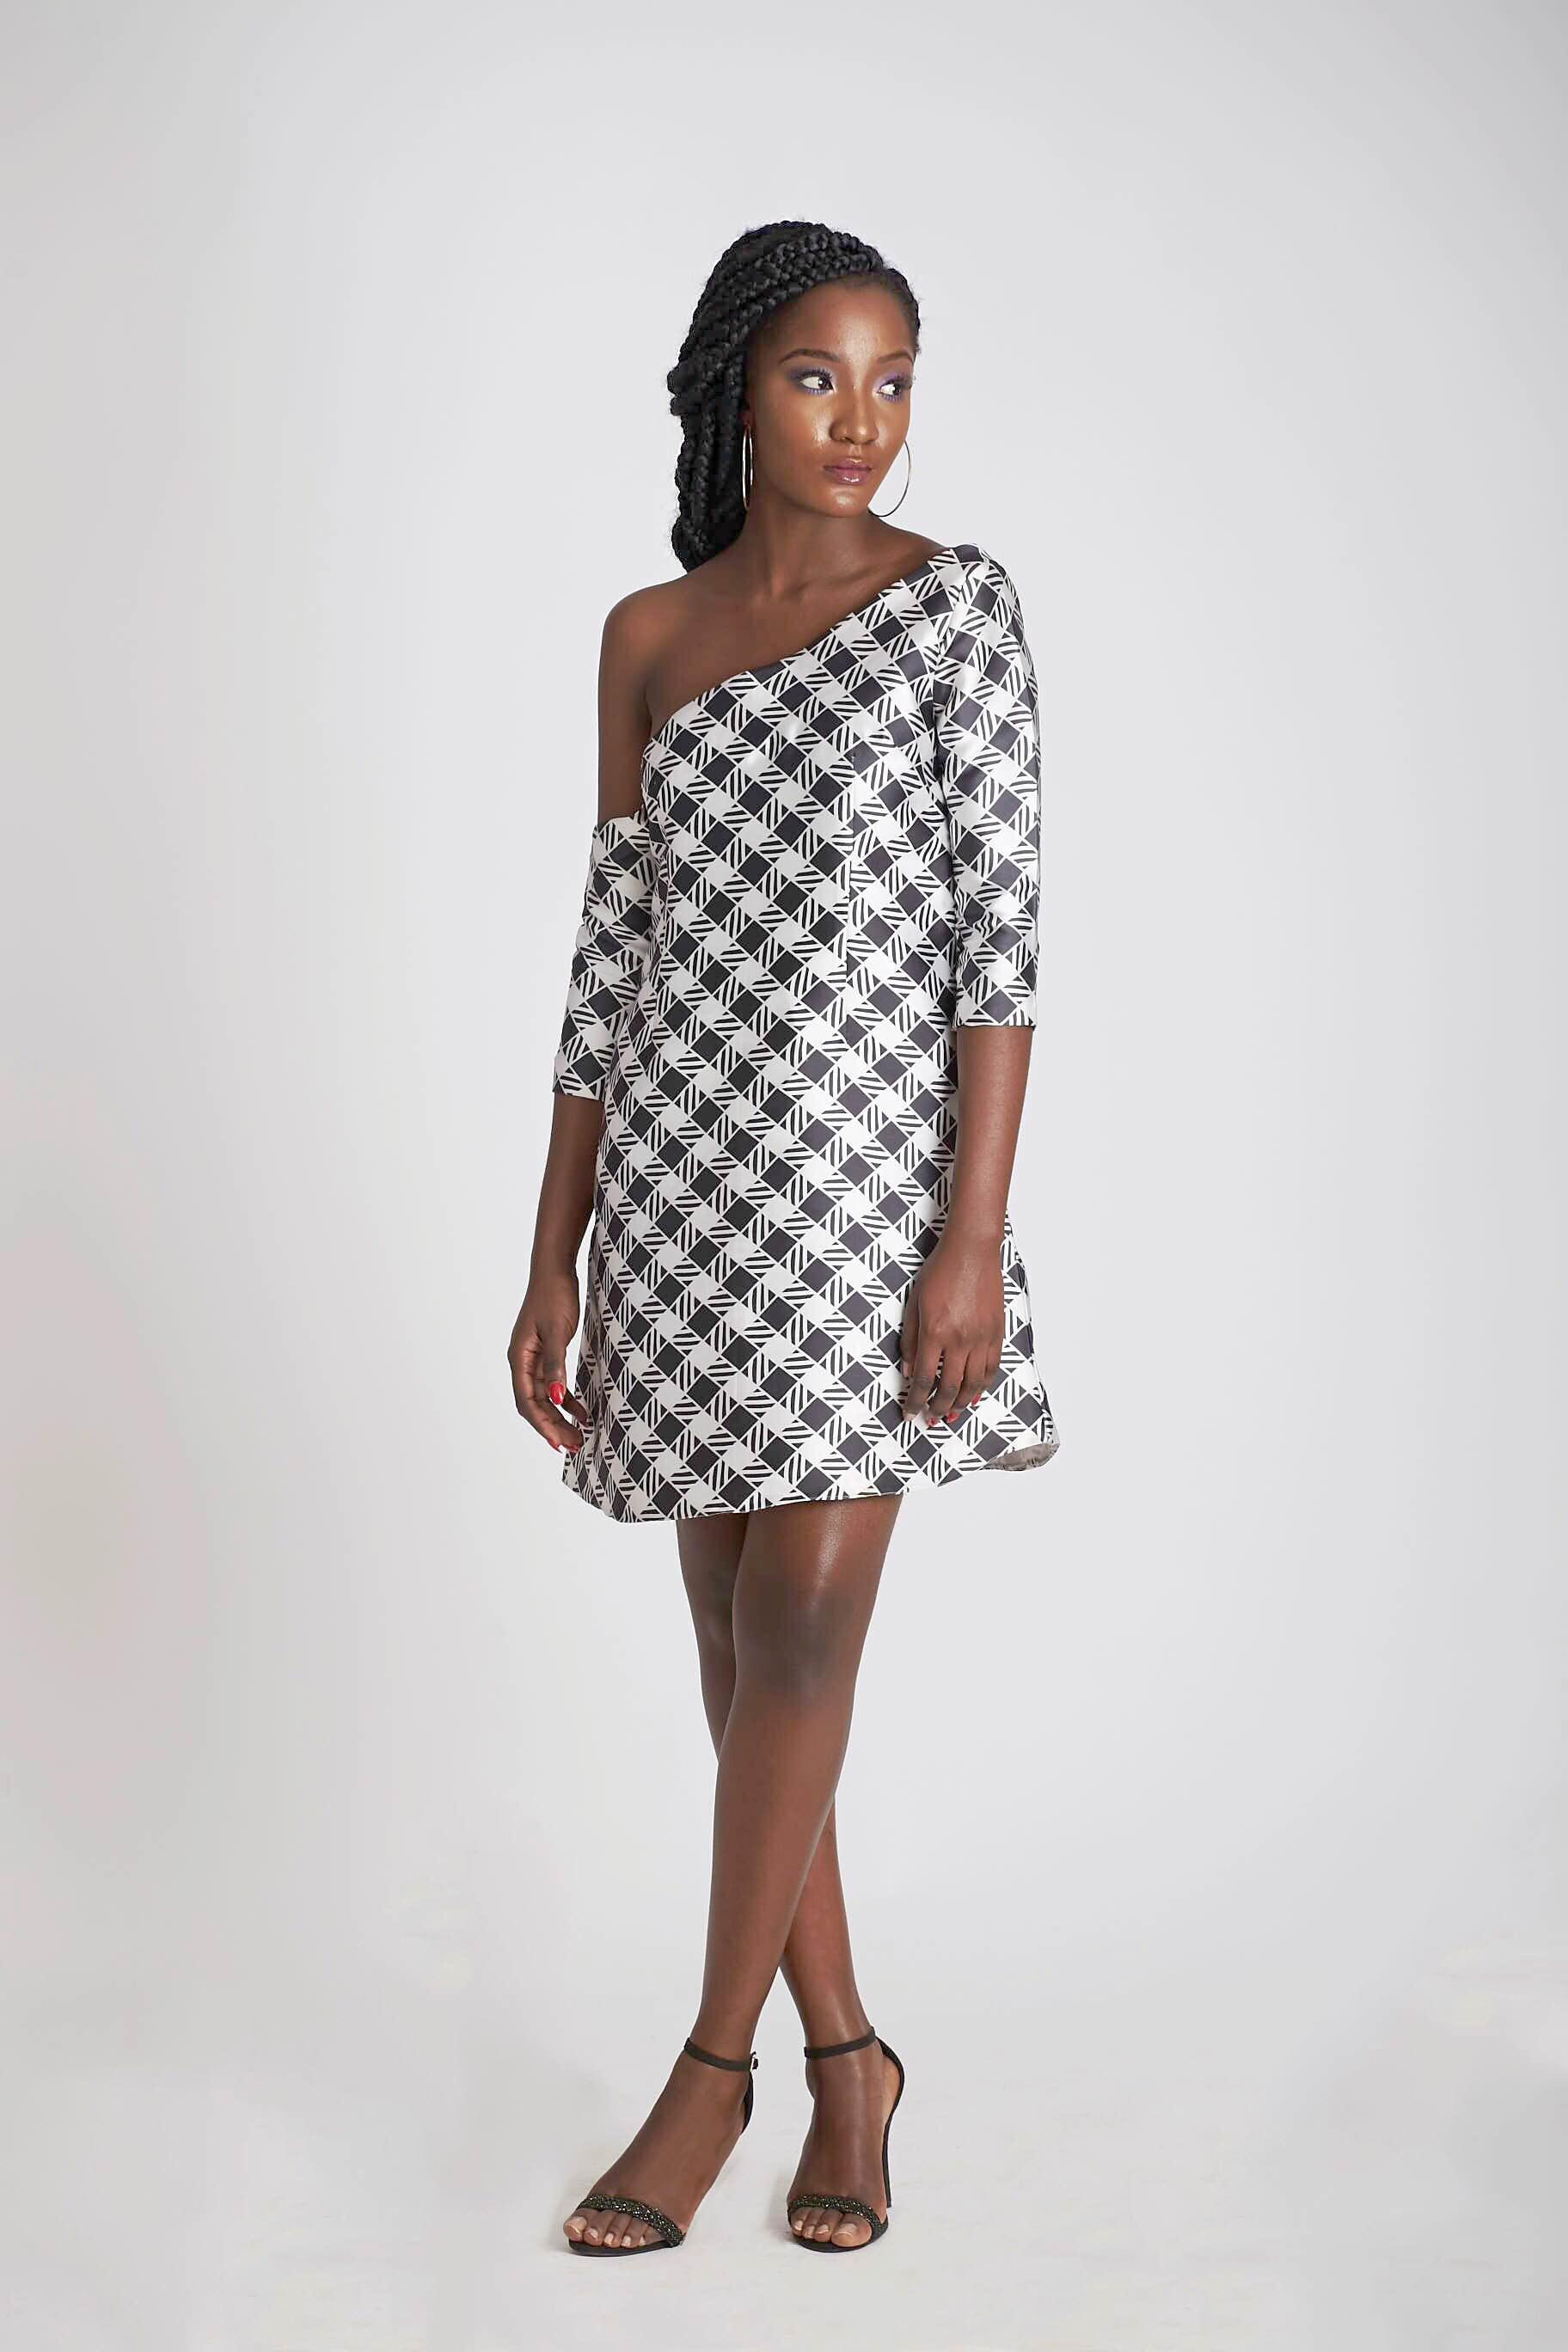 Imad Eduso - BN Style - Collection Lookbook - BellaNaija.com 022